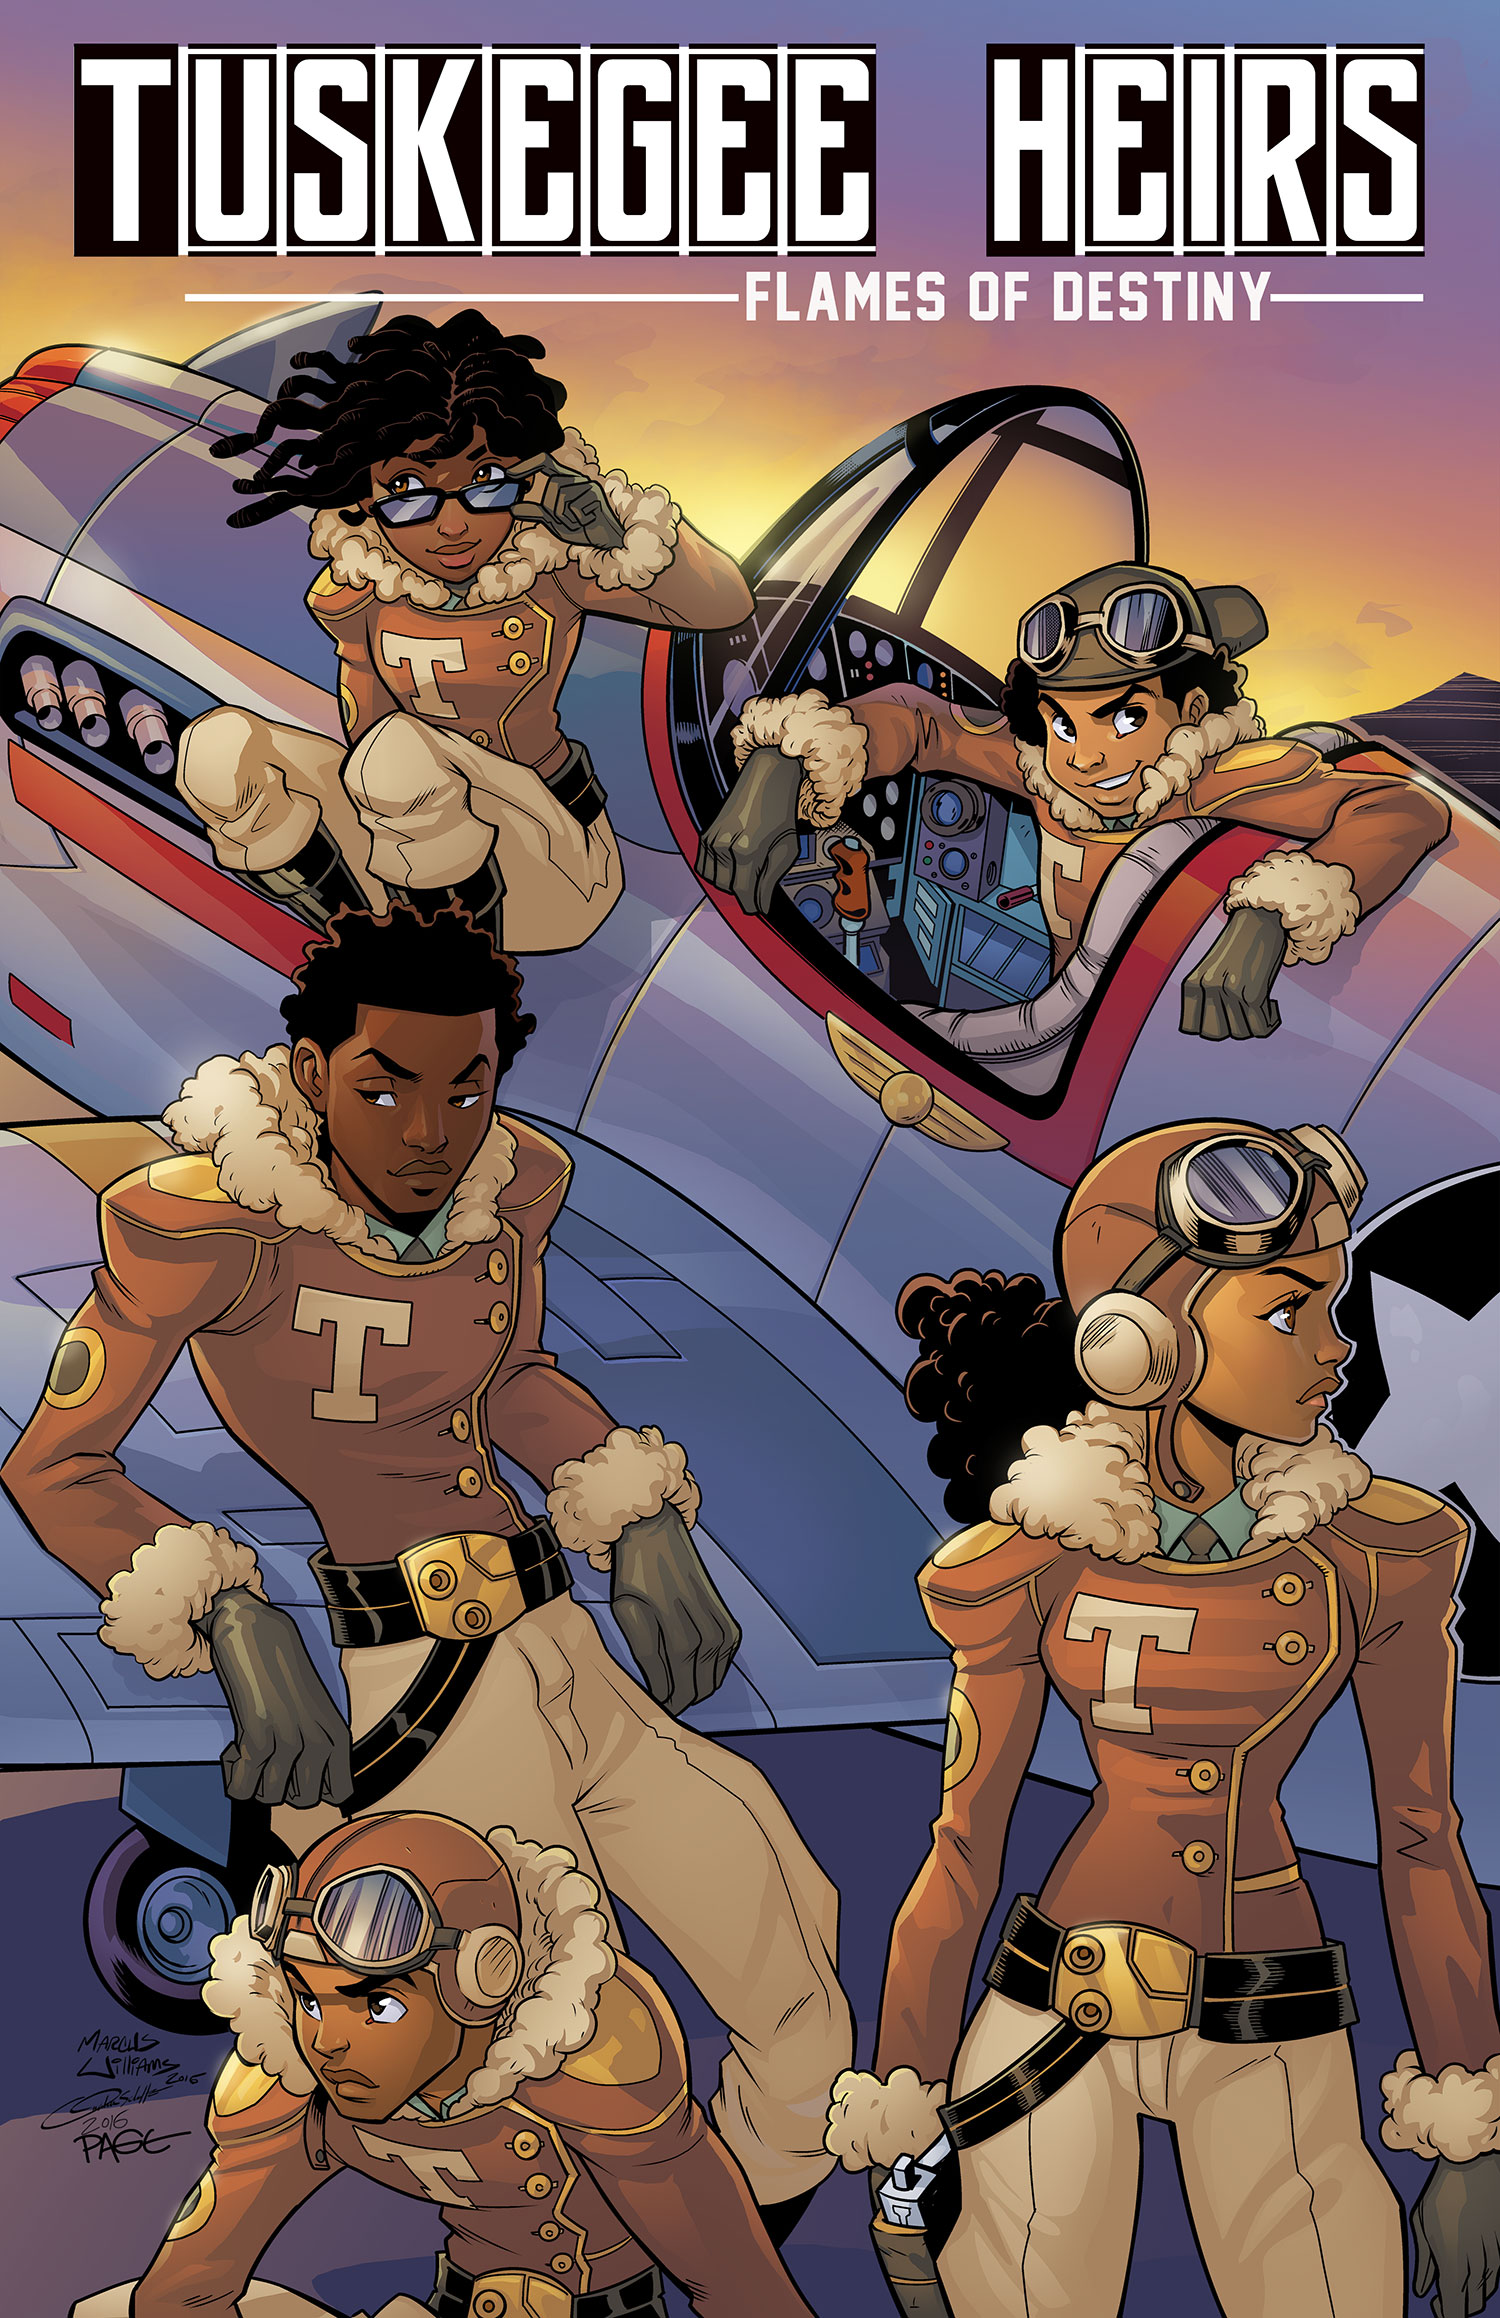 TuskegeeCover-1-Variant-NoNumber-WEB-1.jpg